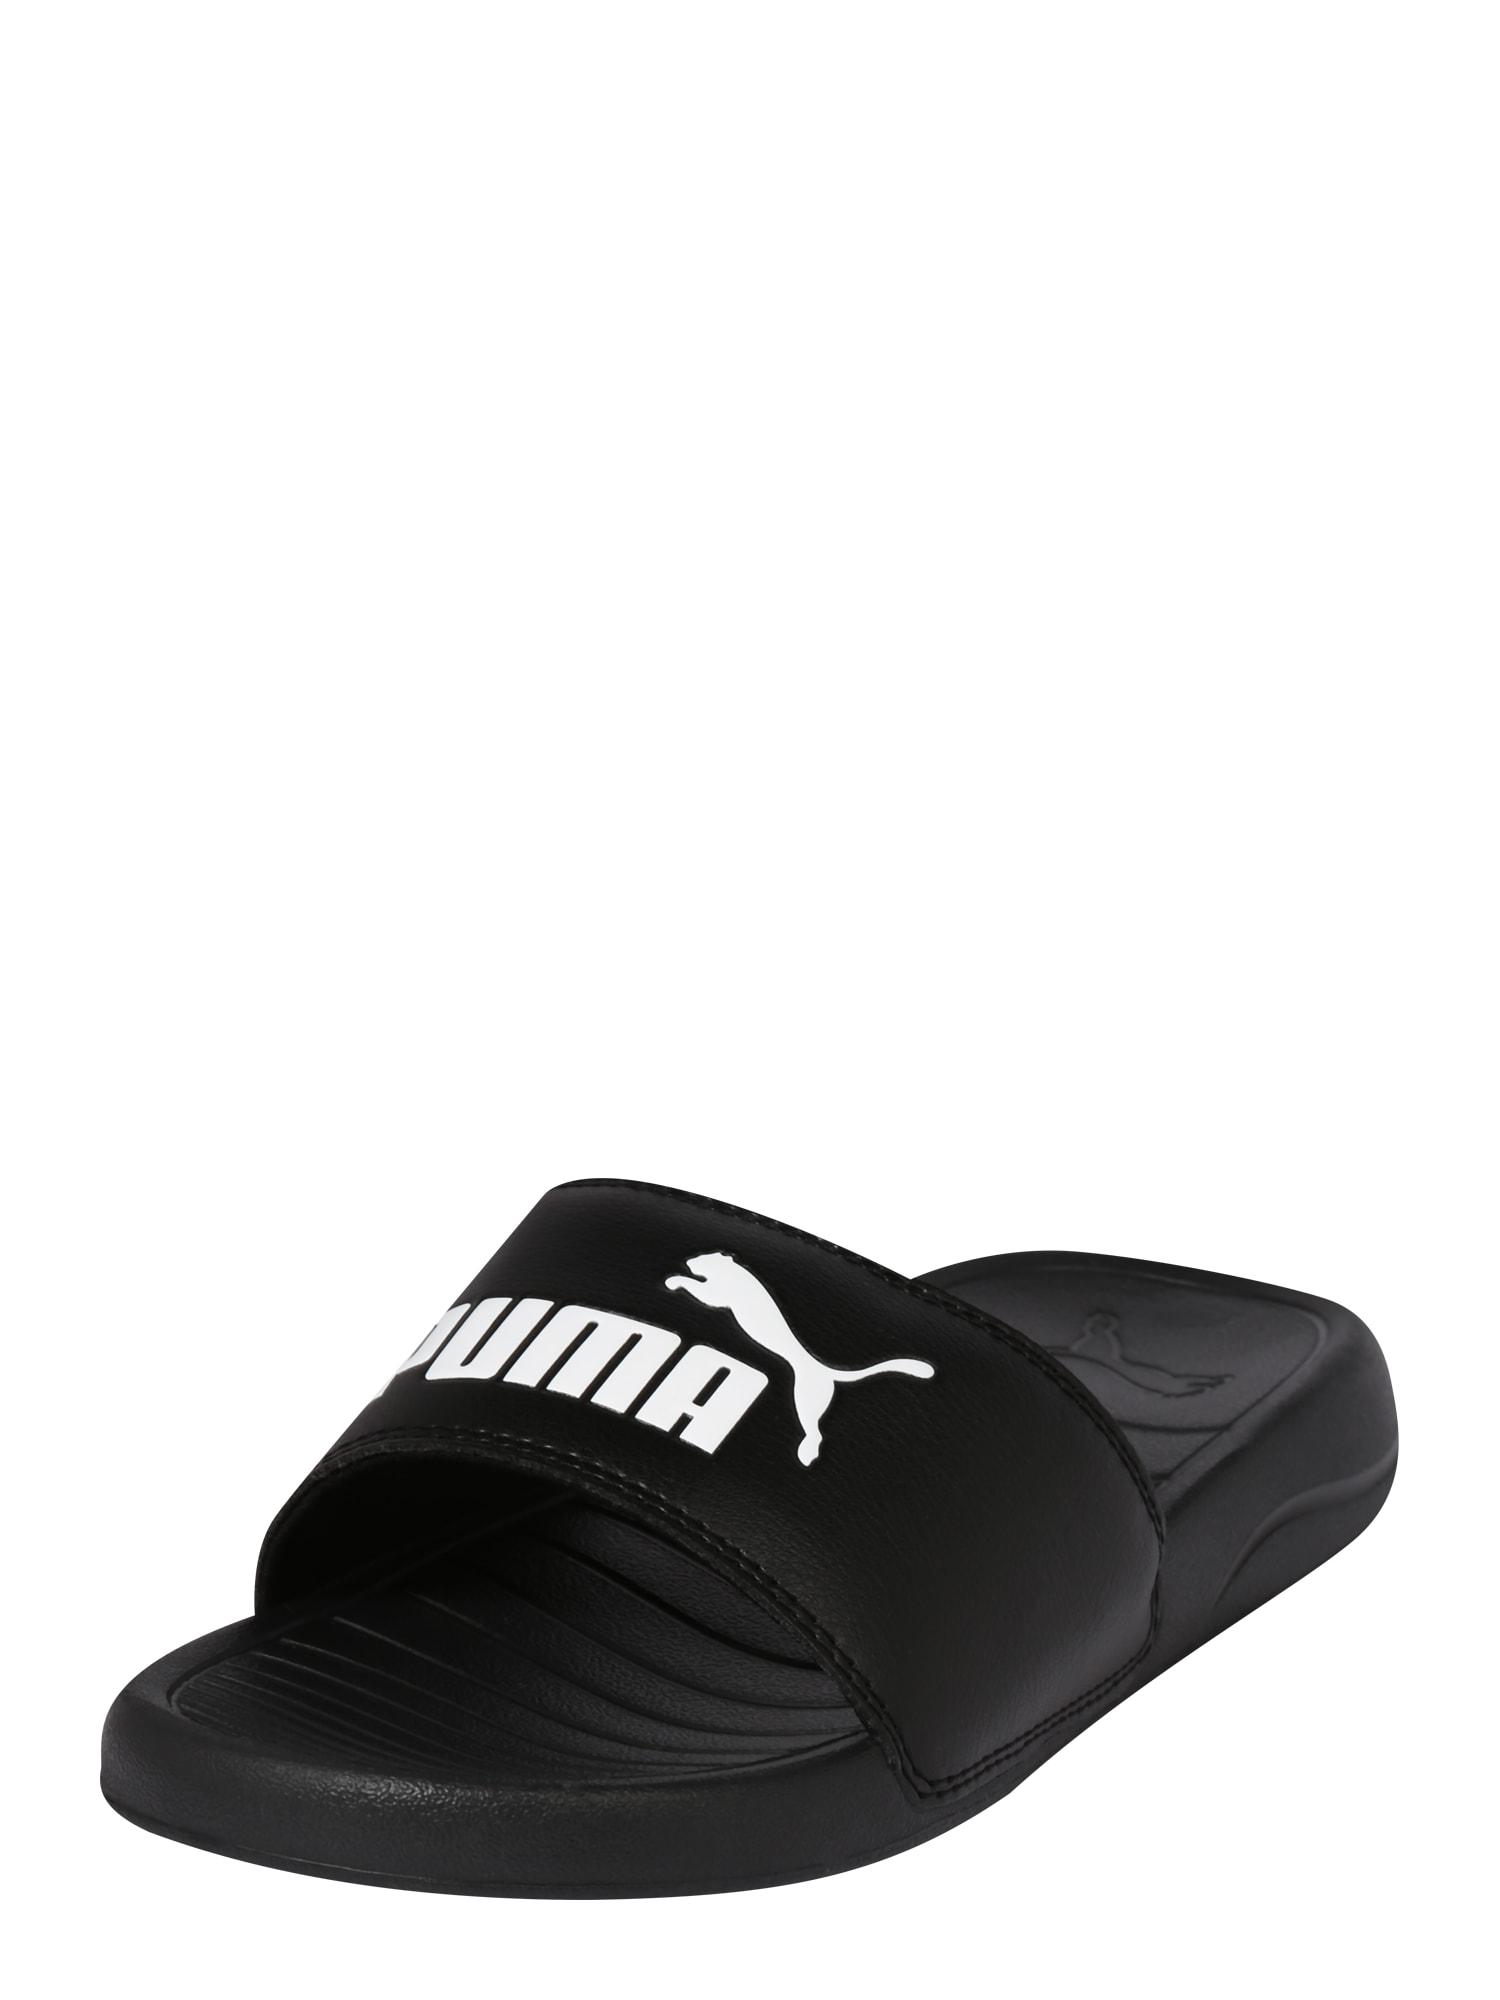 PUMA Sandalai / maudymosi batai 'POPCAT 20' juoda / balta